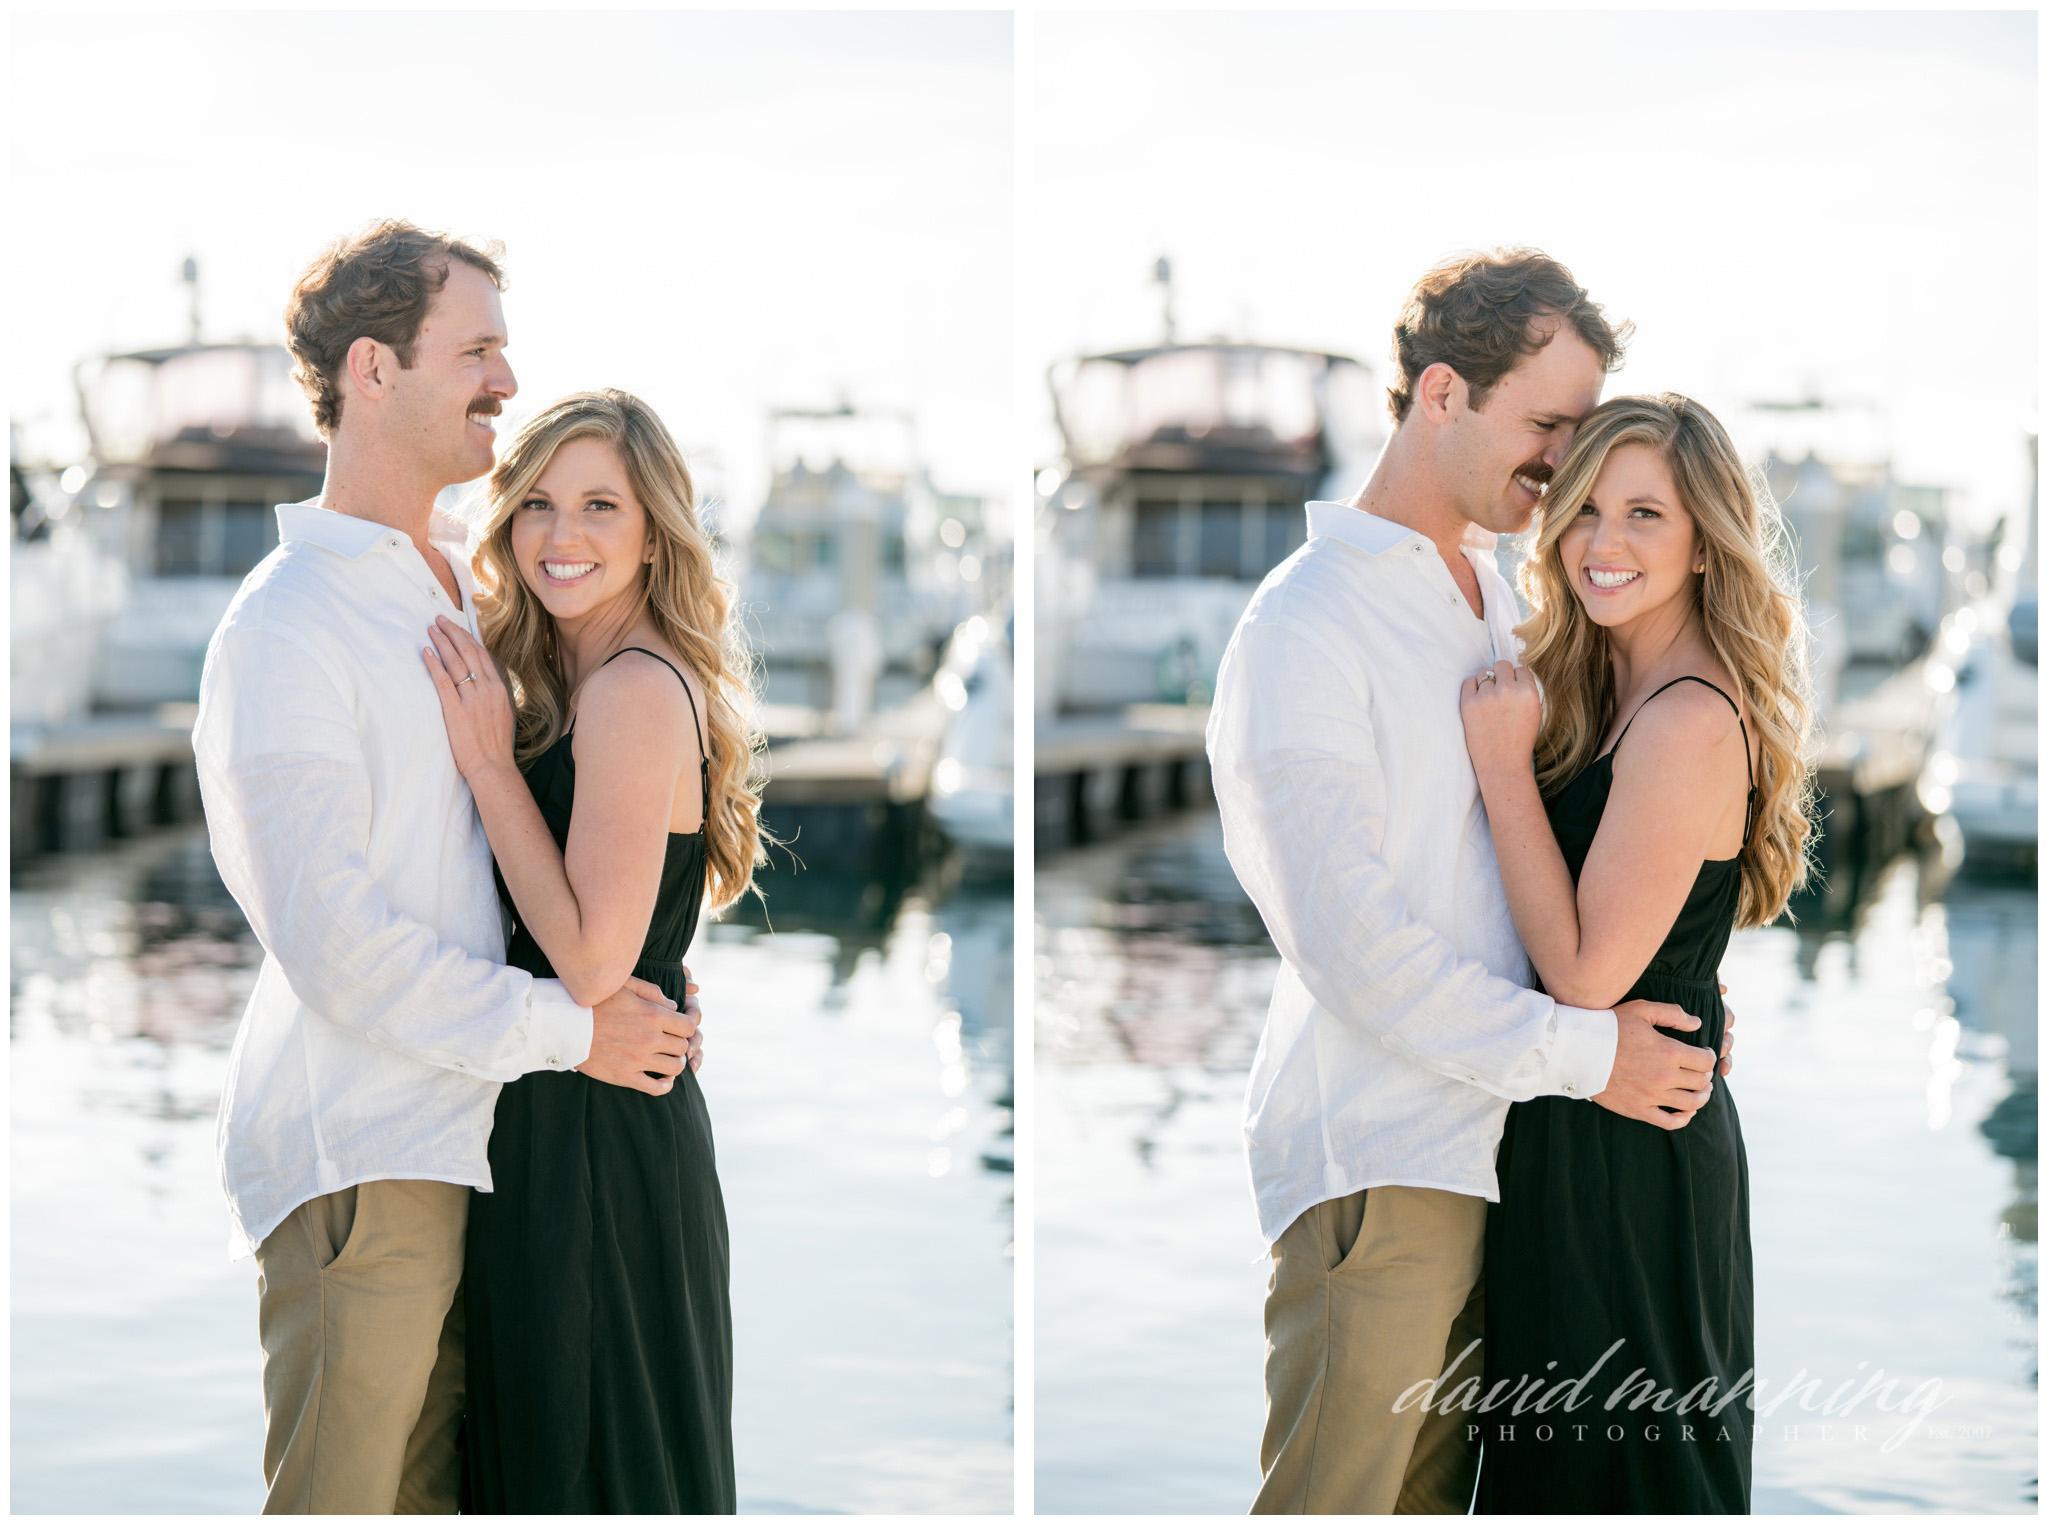 Alyssa-Taylor-Engagement-David-Manning-Photographer-0090.JPG